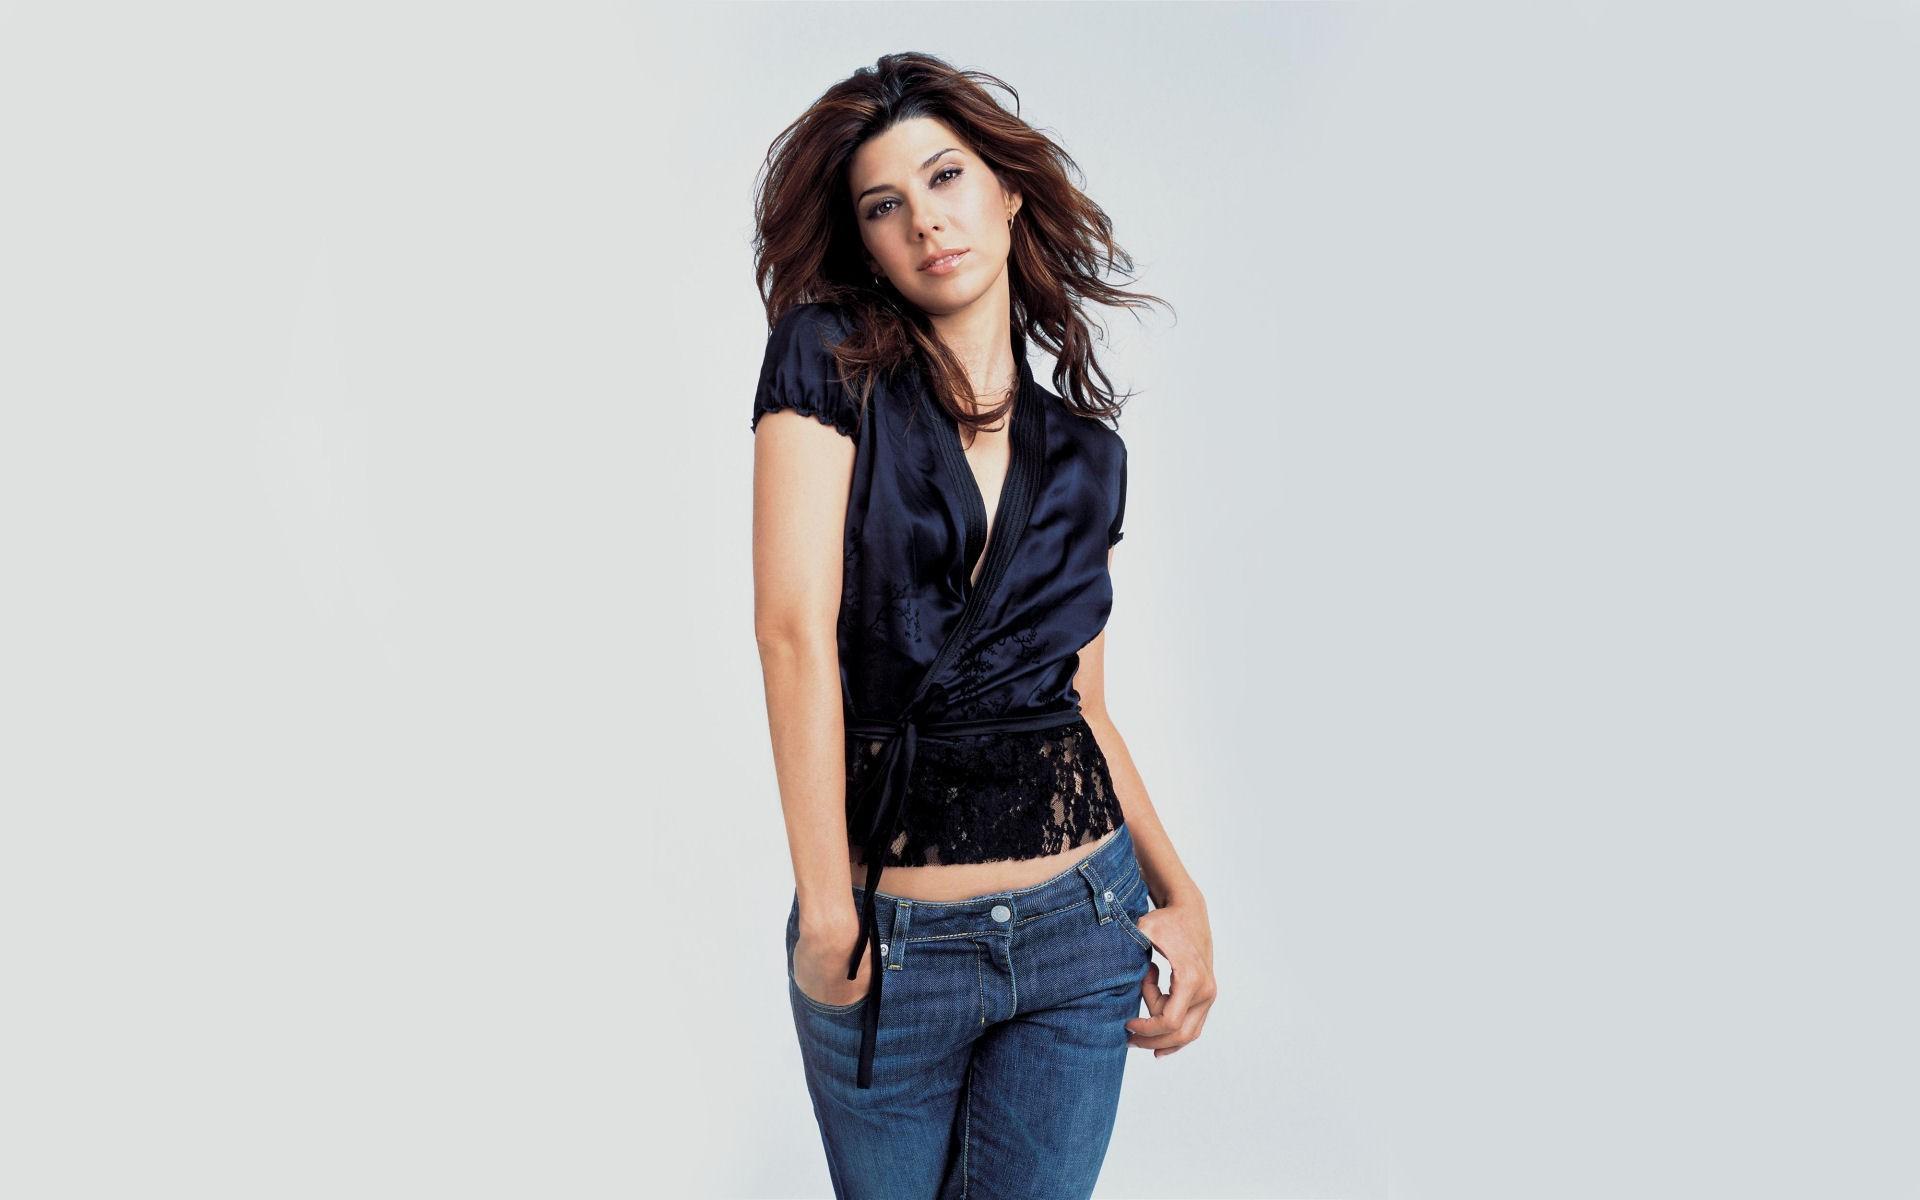 Marisa Tomei Wallpapers HD